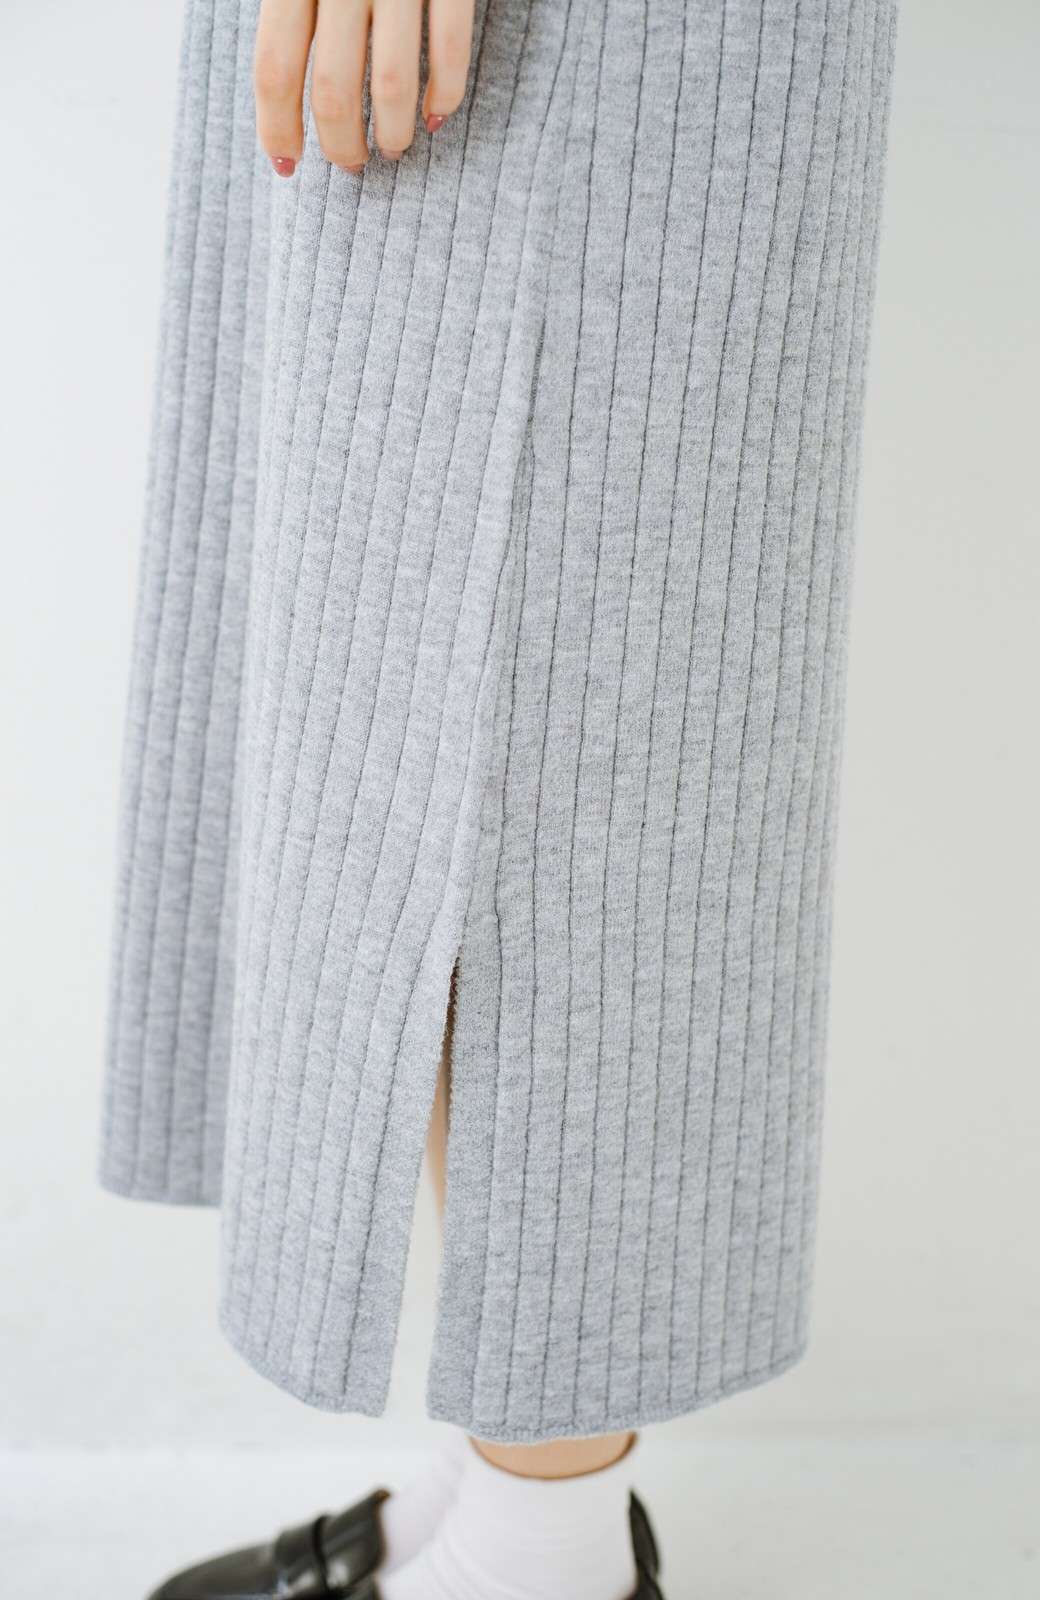 haco! セットで着るだけパッとかわいい ニットトップス&ノースリーブニットワンピースセット <グレー>の商品写真29